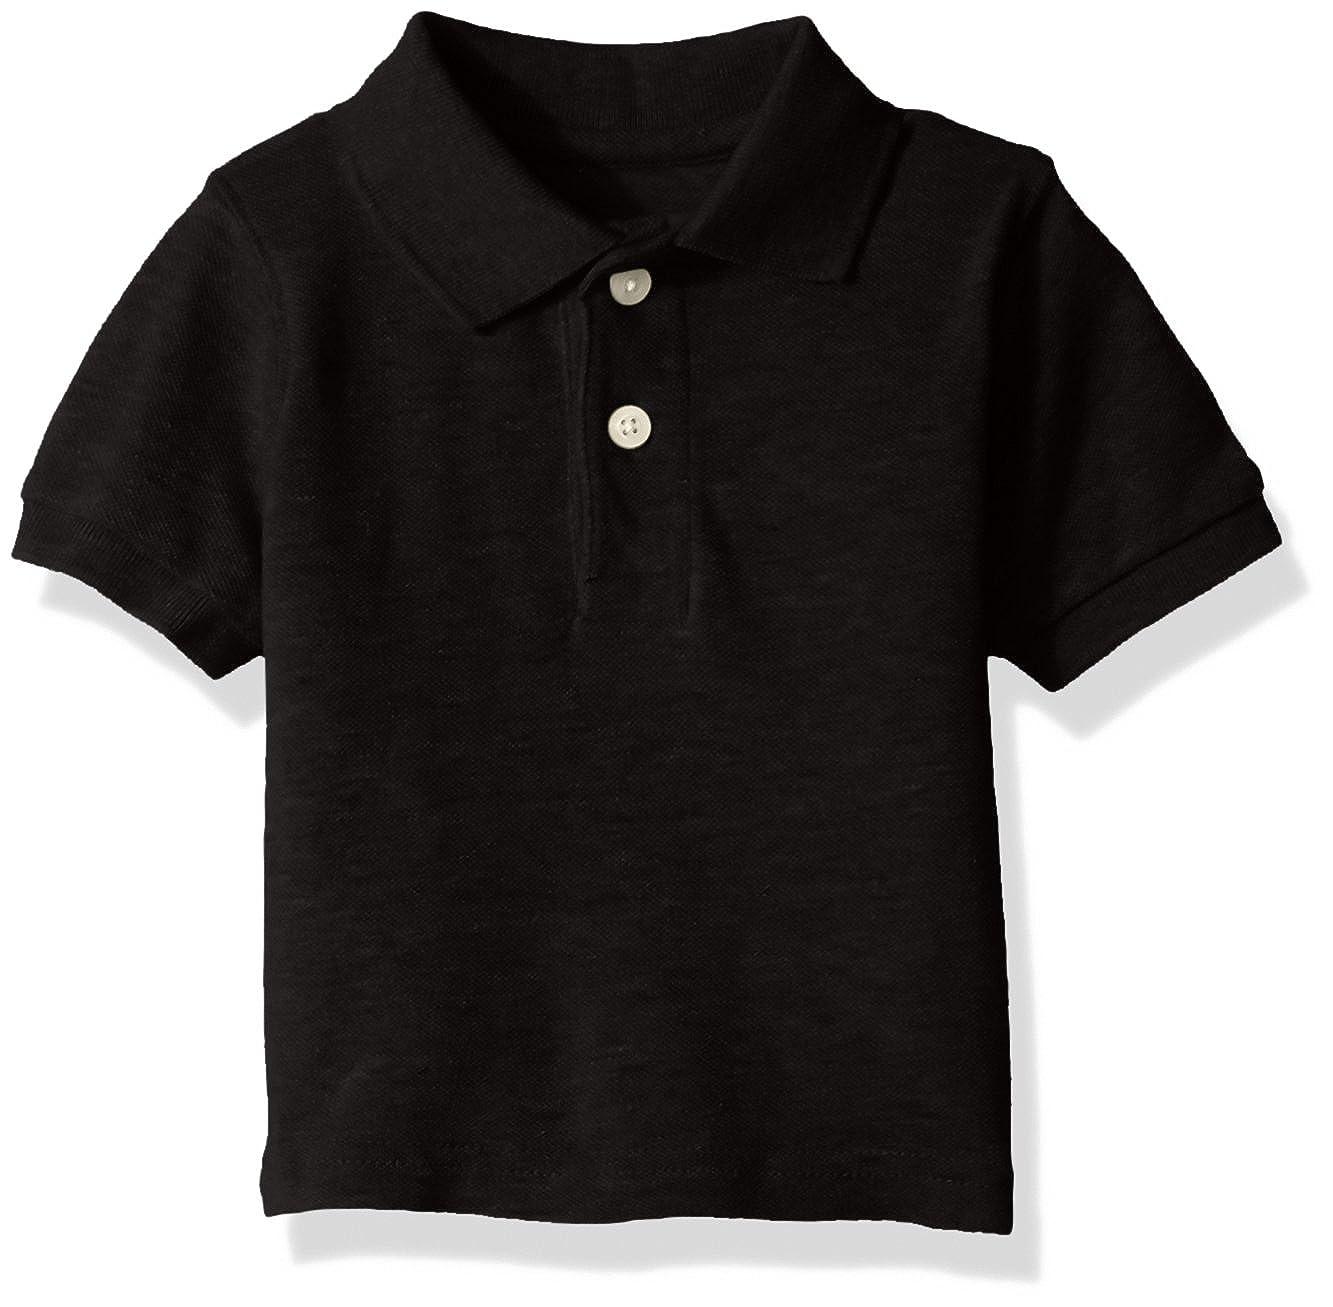 The Children's Place Boys' Short Sleeve Uniform Polo Shirt